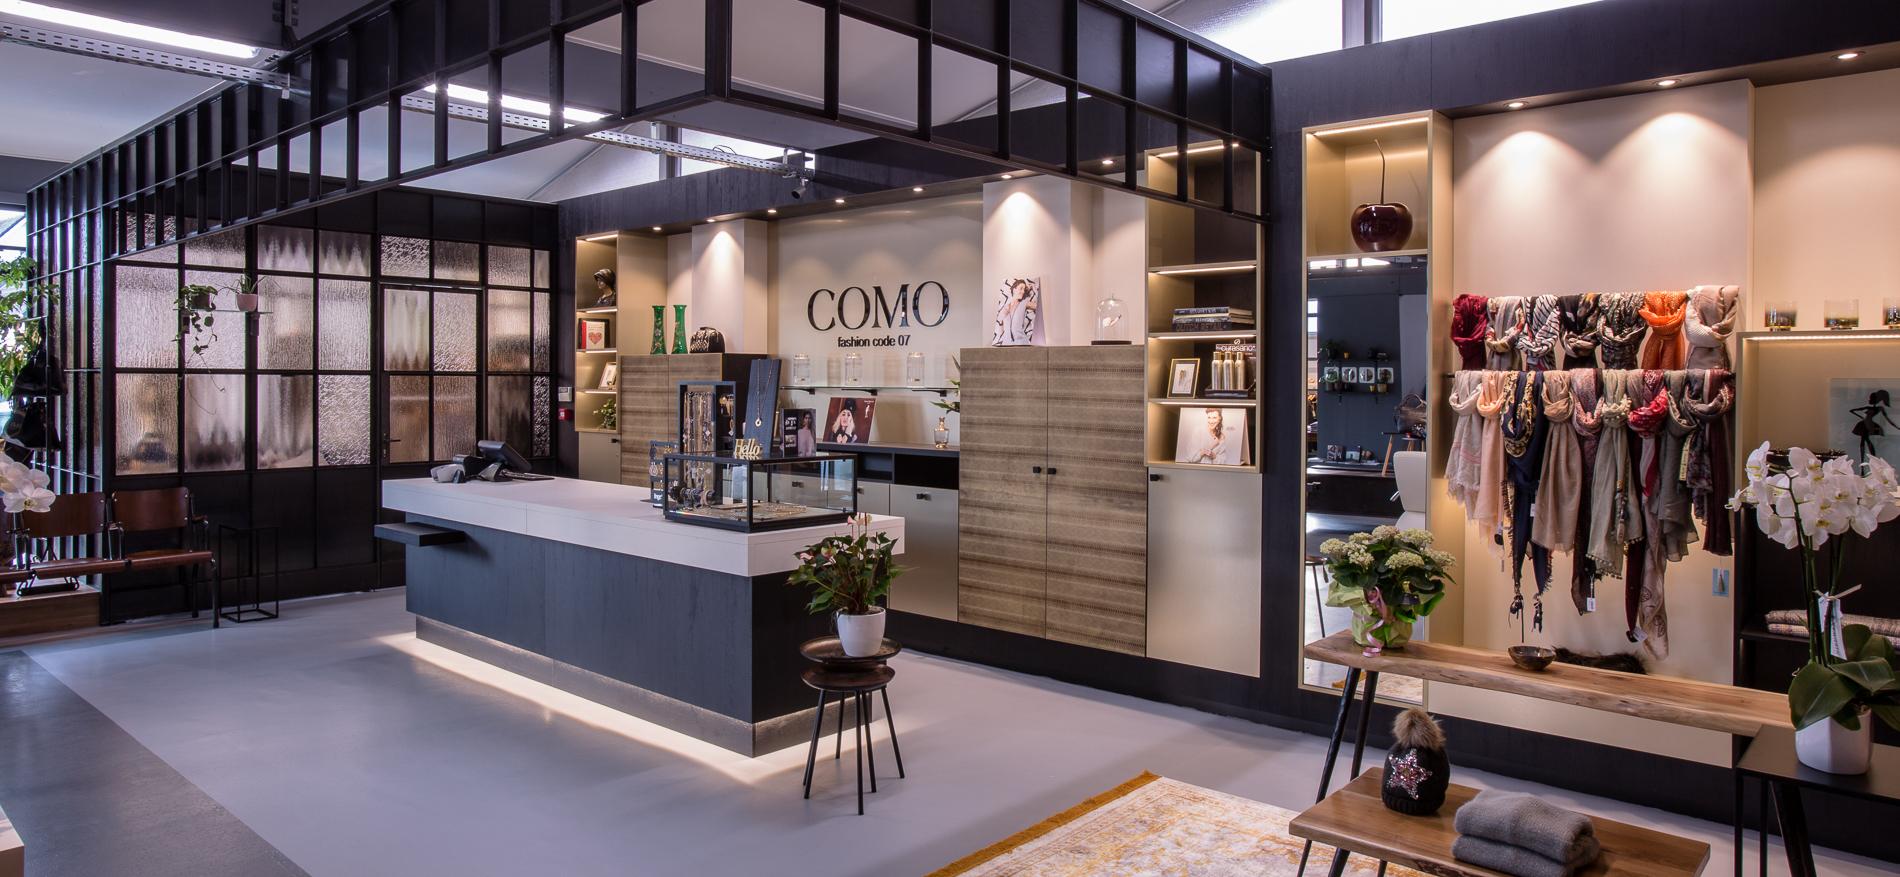 Como Fashion Code 07 | Shop Design